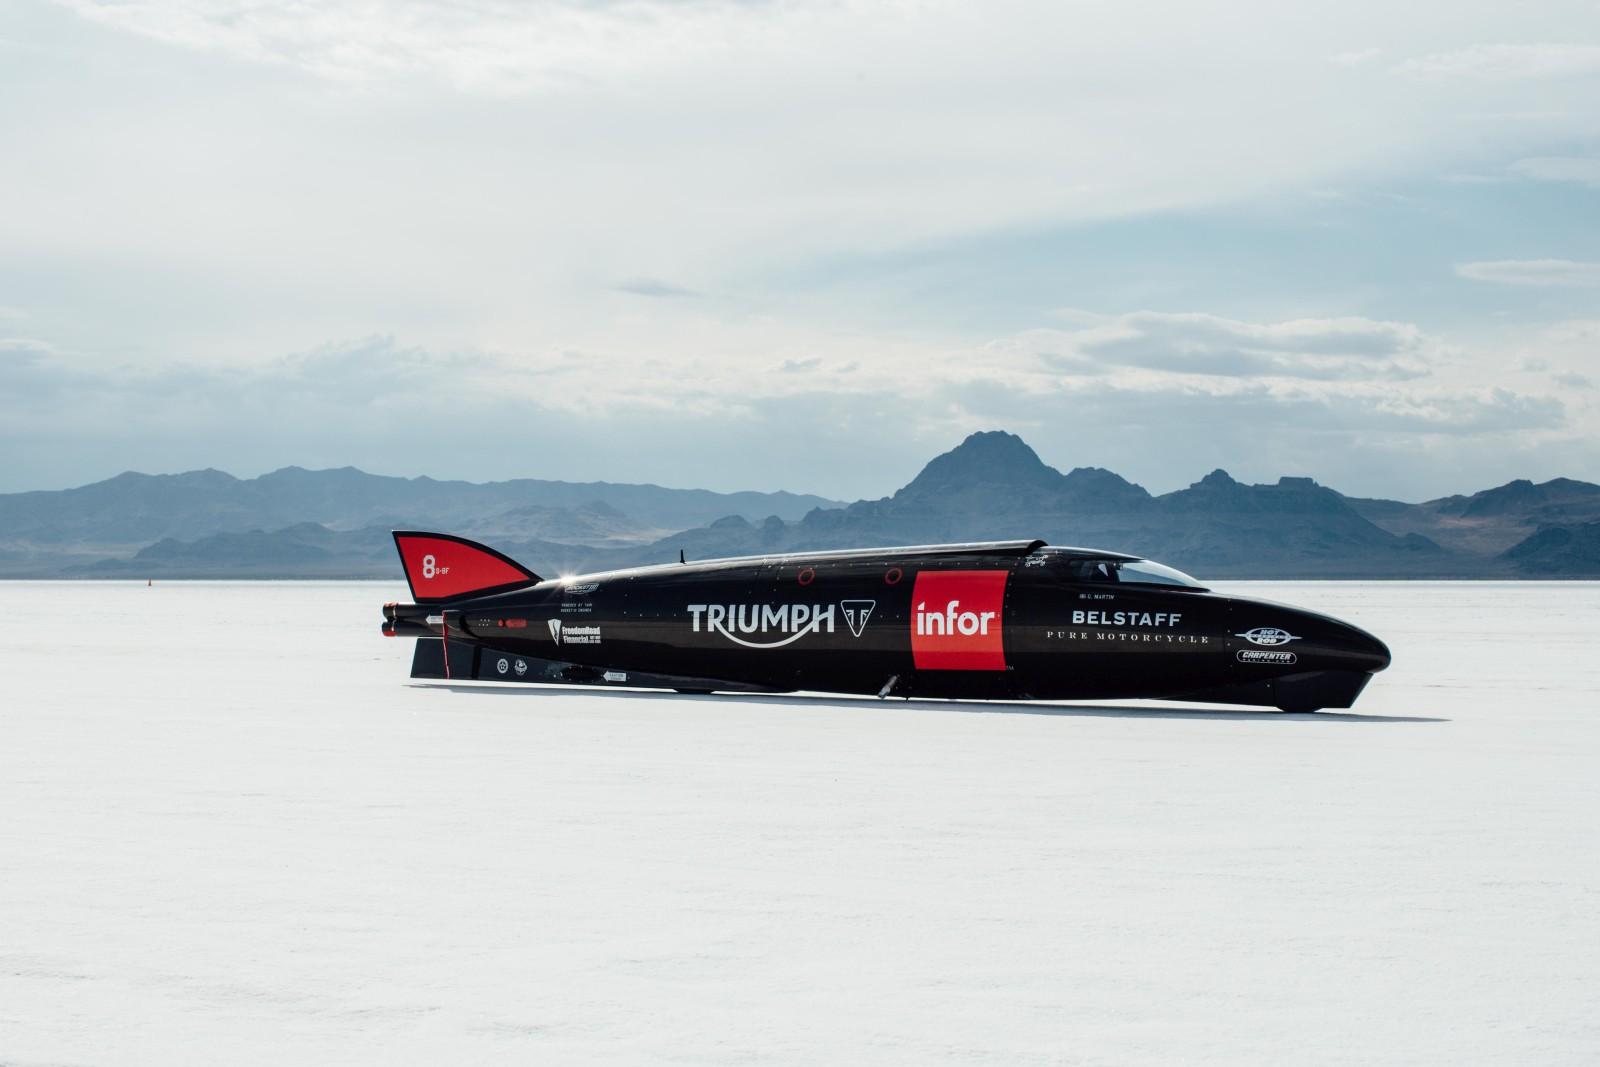 Triumph Infor Rocket Streamliner - Record Run